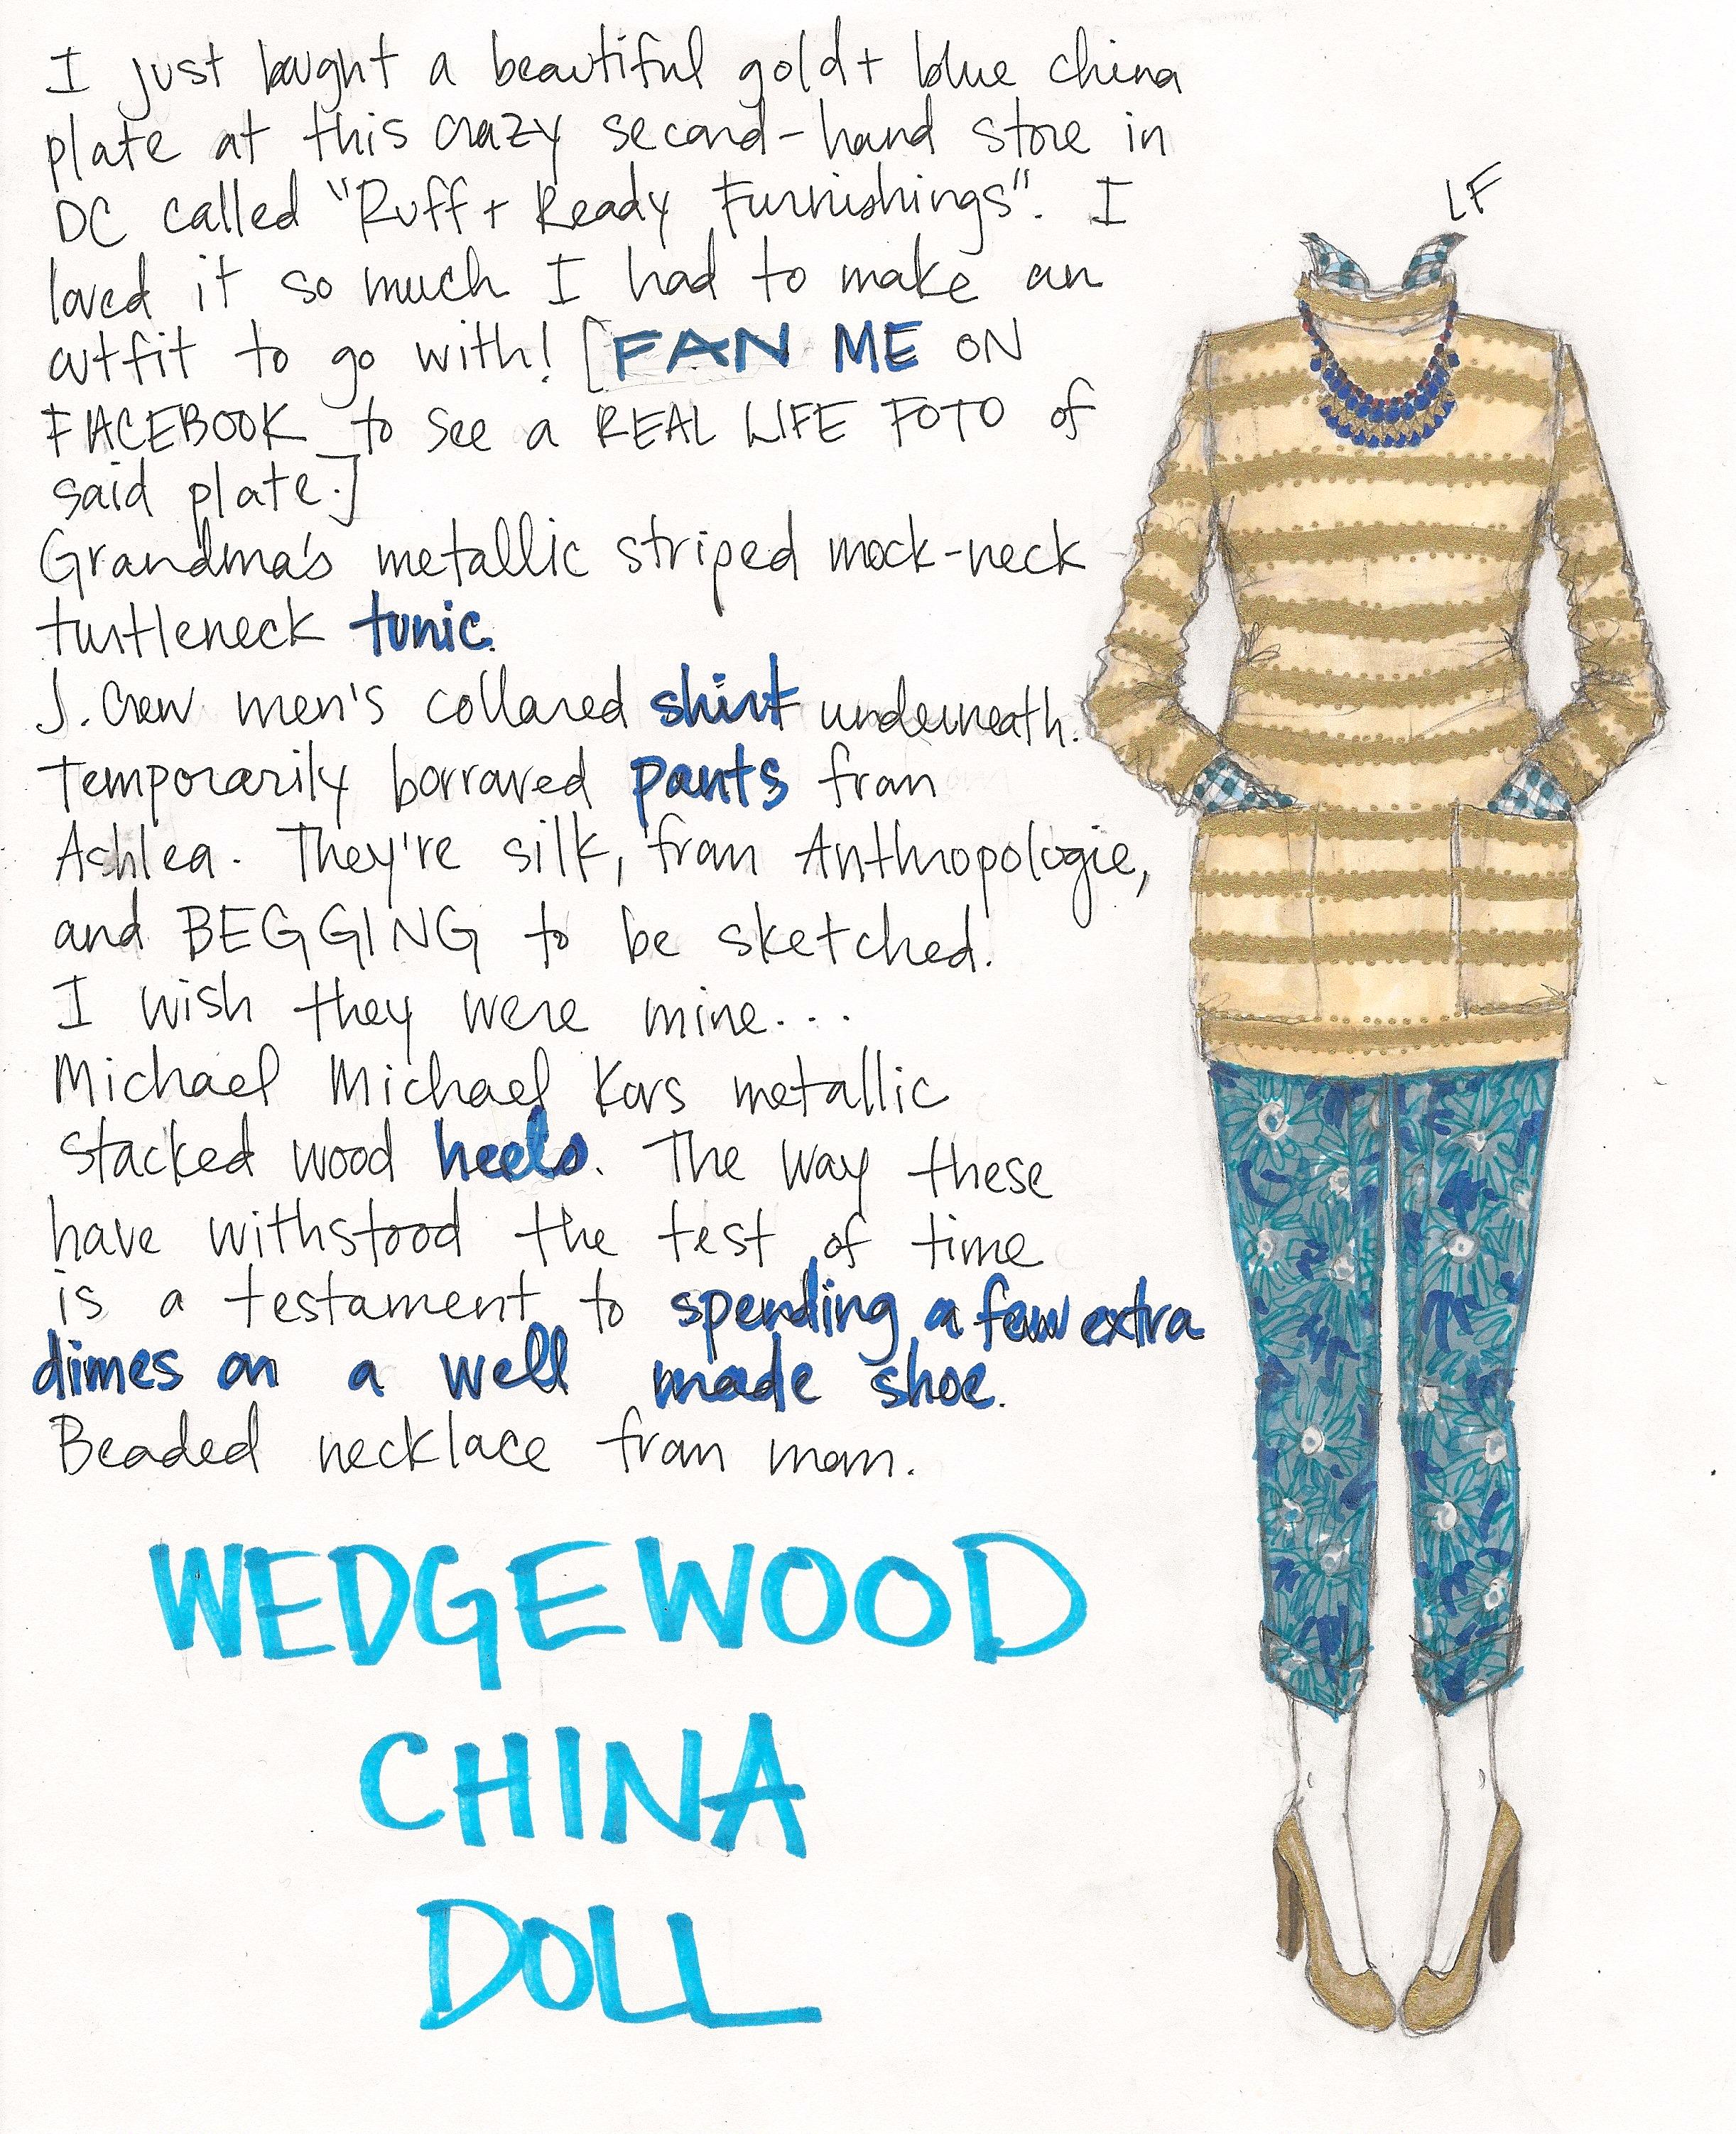 wedgewoodchinadoll.jpg